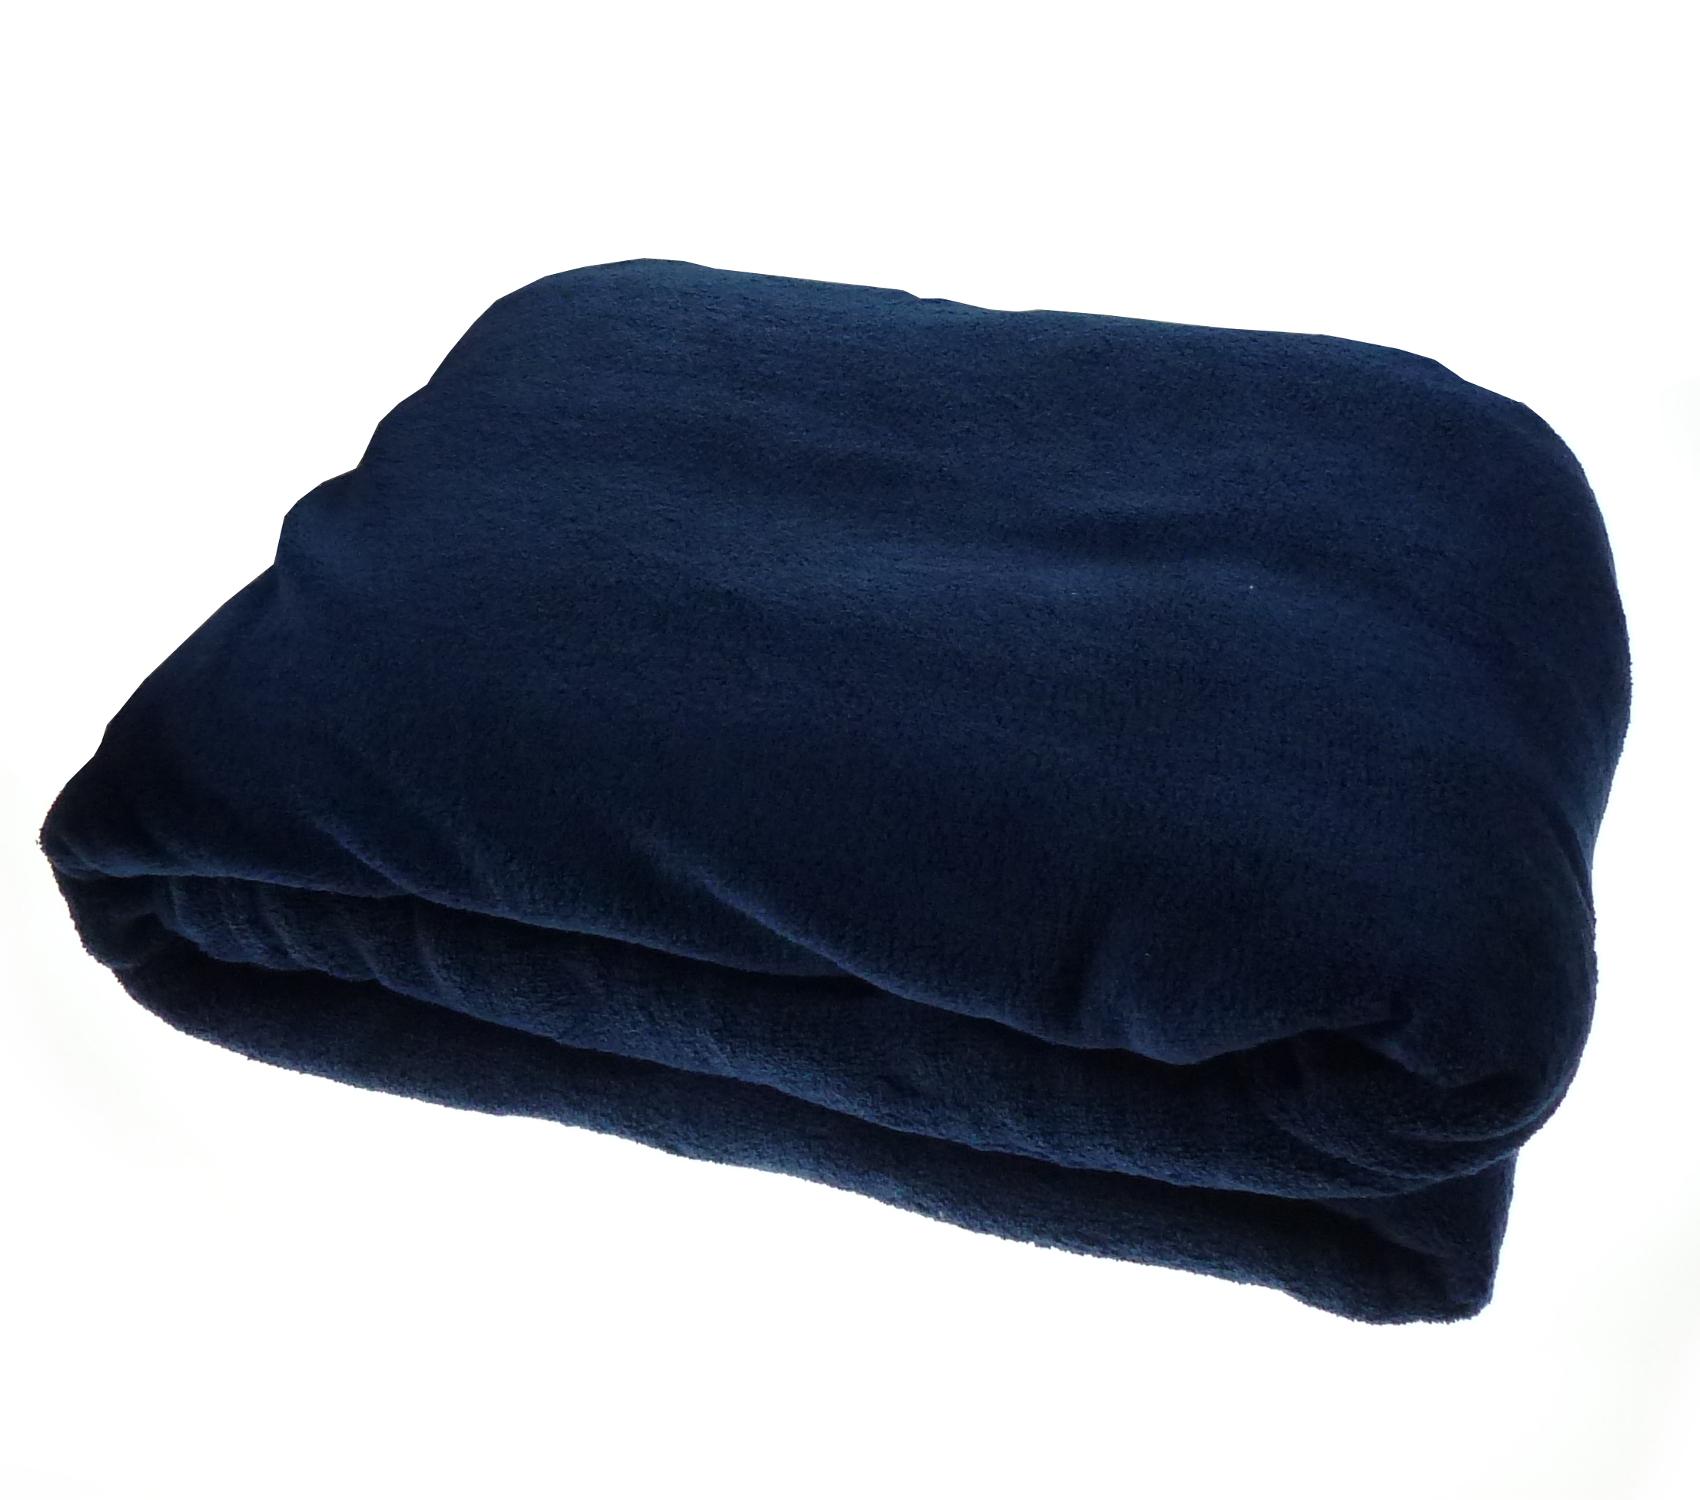 Soft Coral Fleece Blanket Cosy Warm Bed Sofa Luxury Fleecy